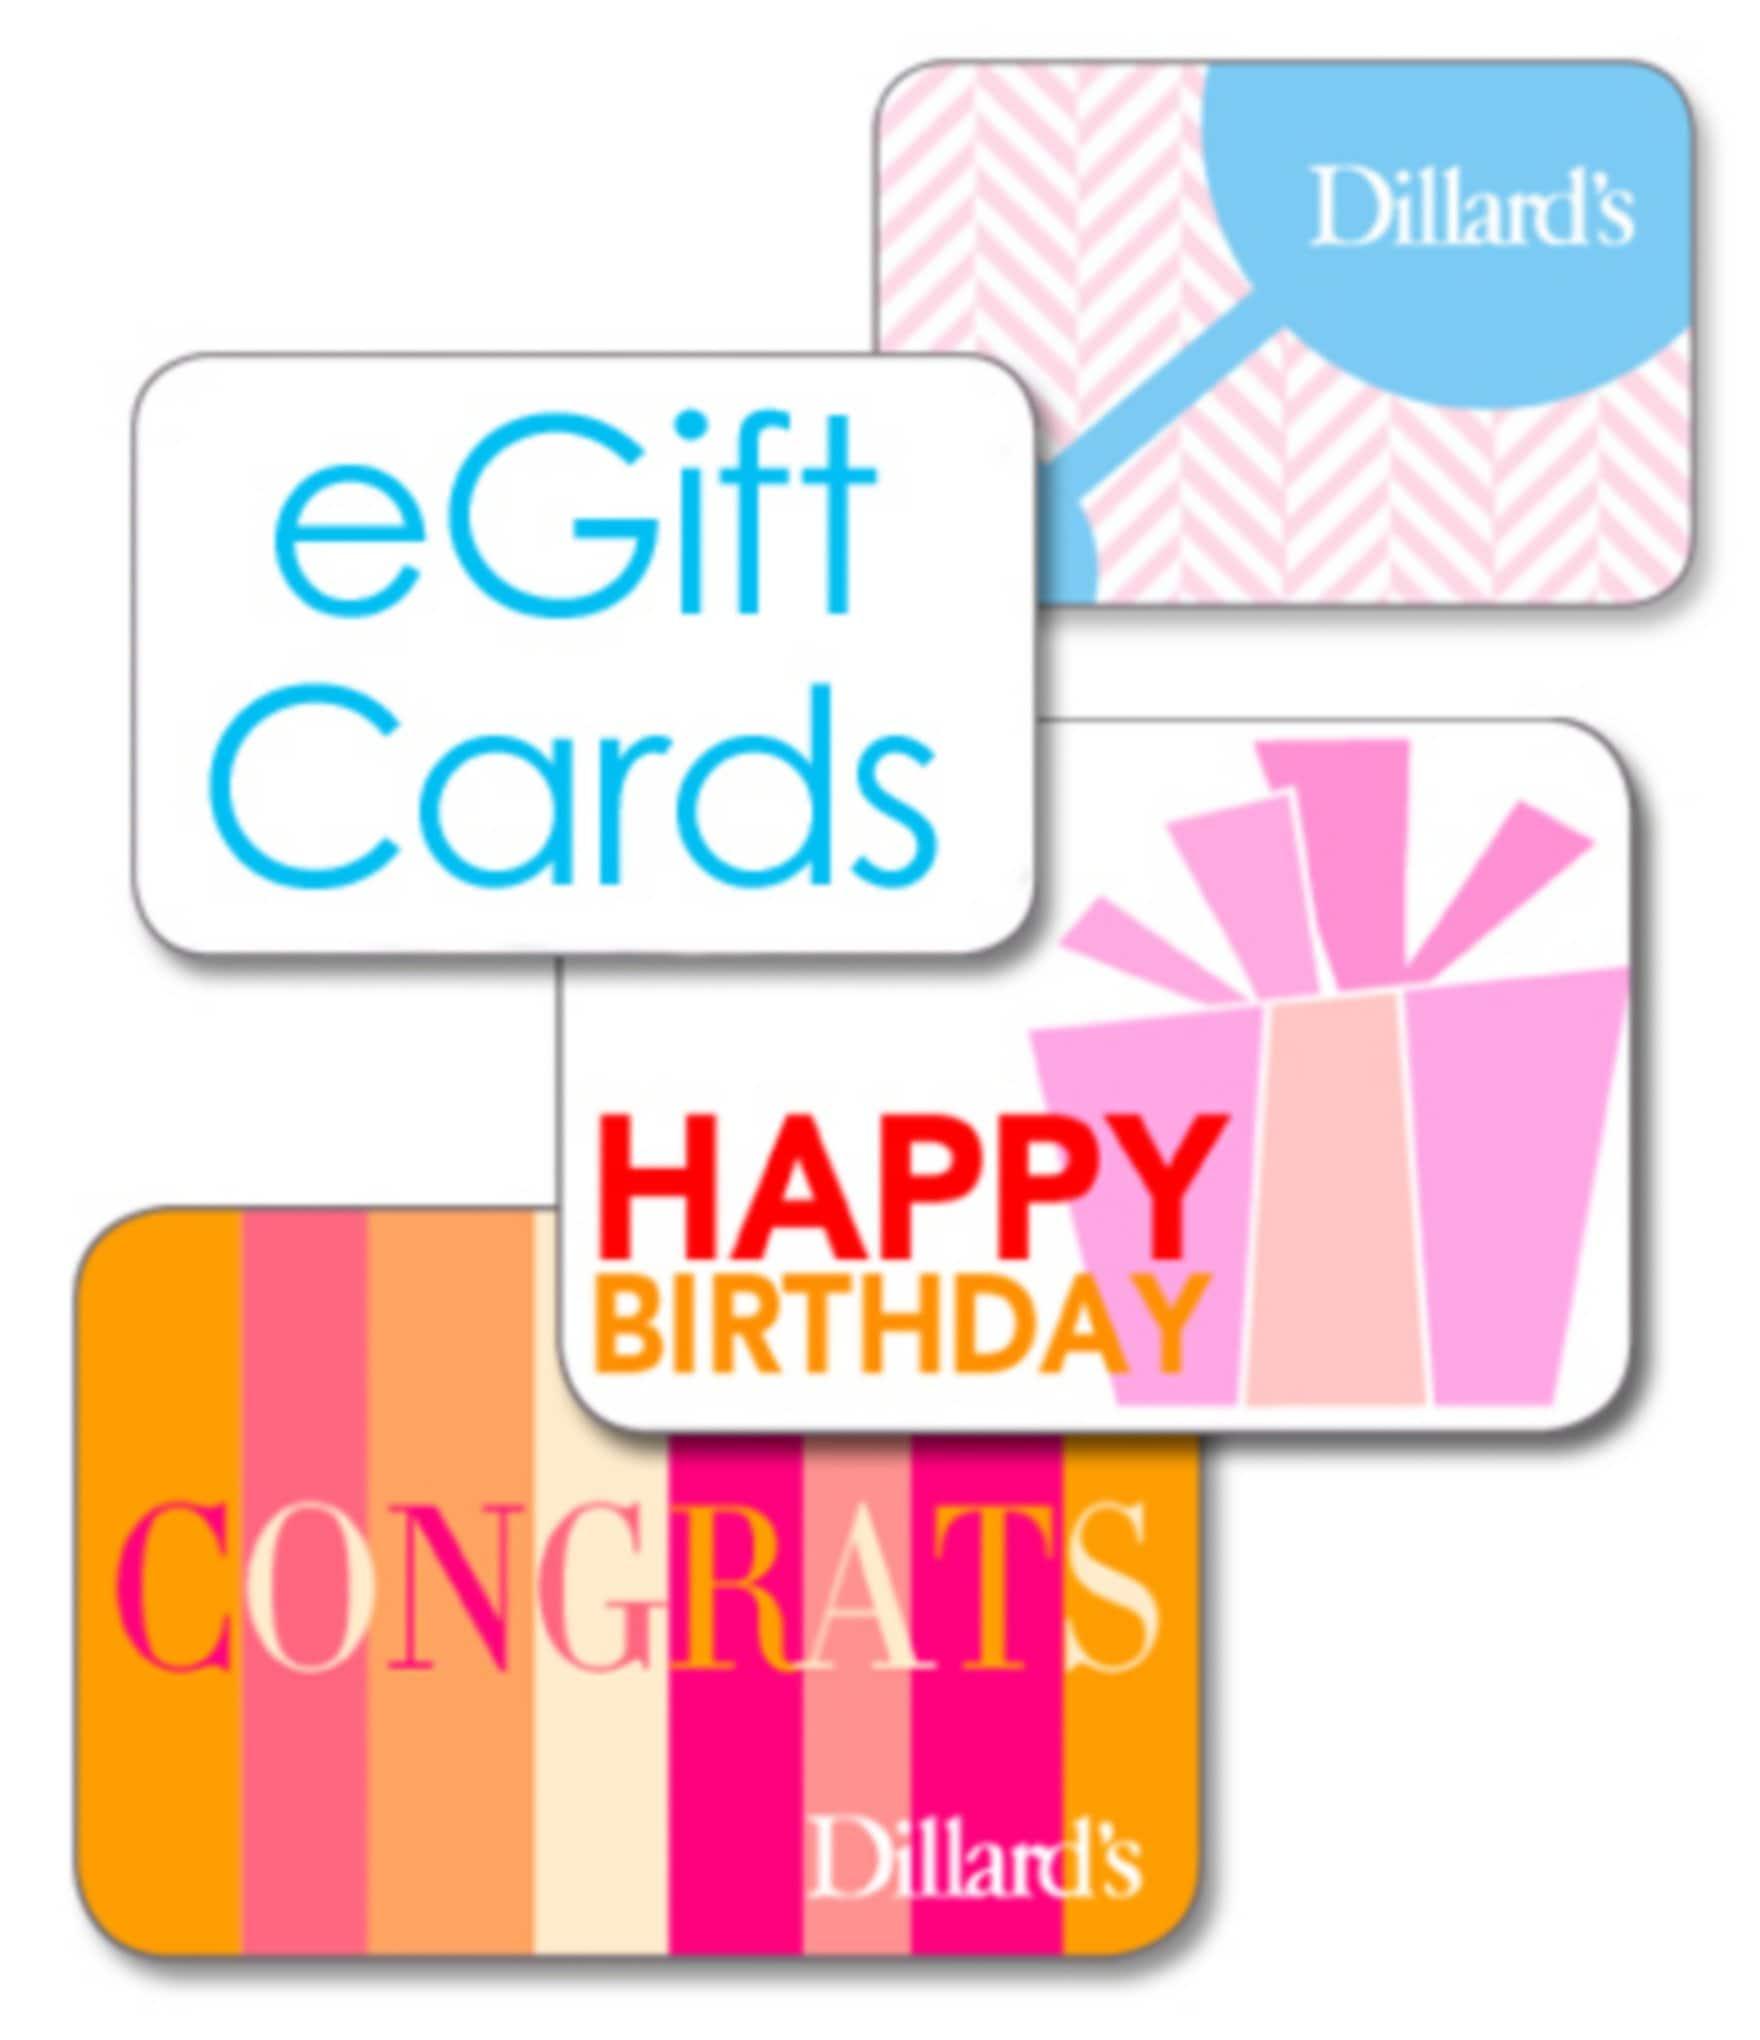 Dillards Egift Card Dillards